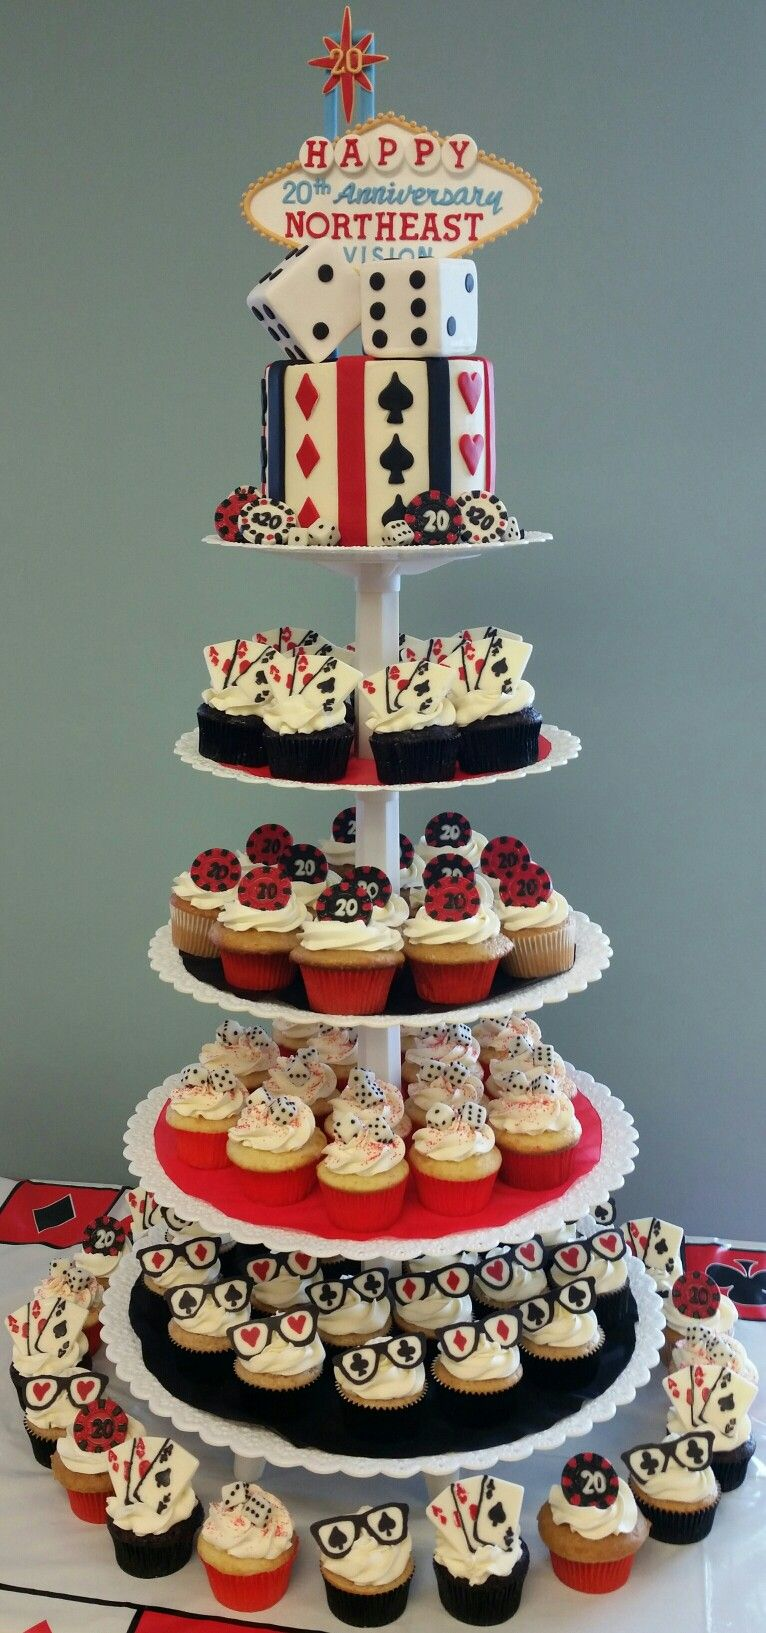 prix plancher chaussures élégantes bonne vente de chaussures Cake and cupcakes for a casino themed 20th anniversary ...